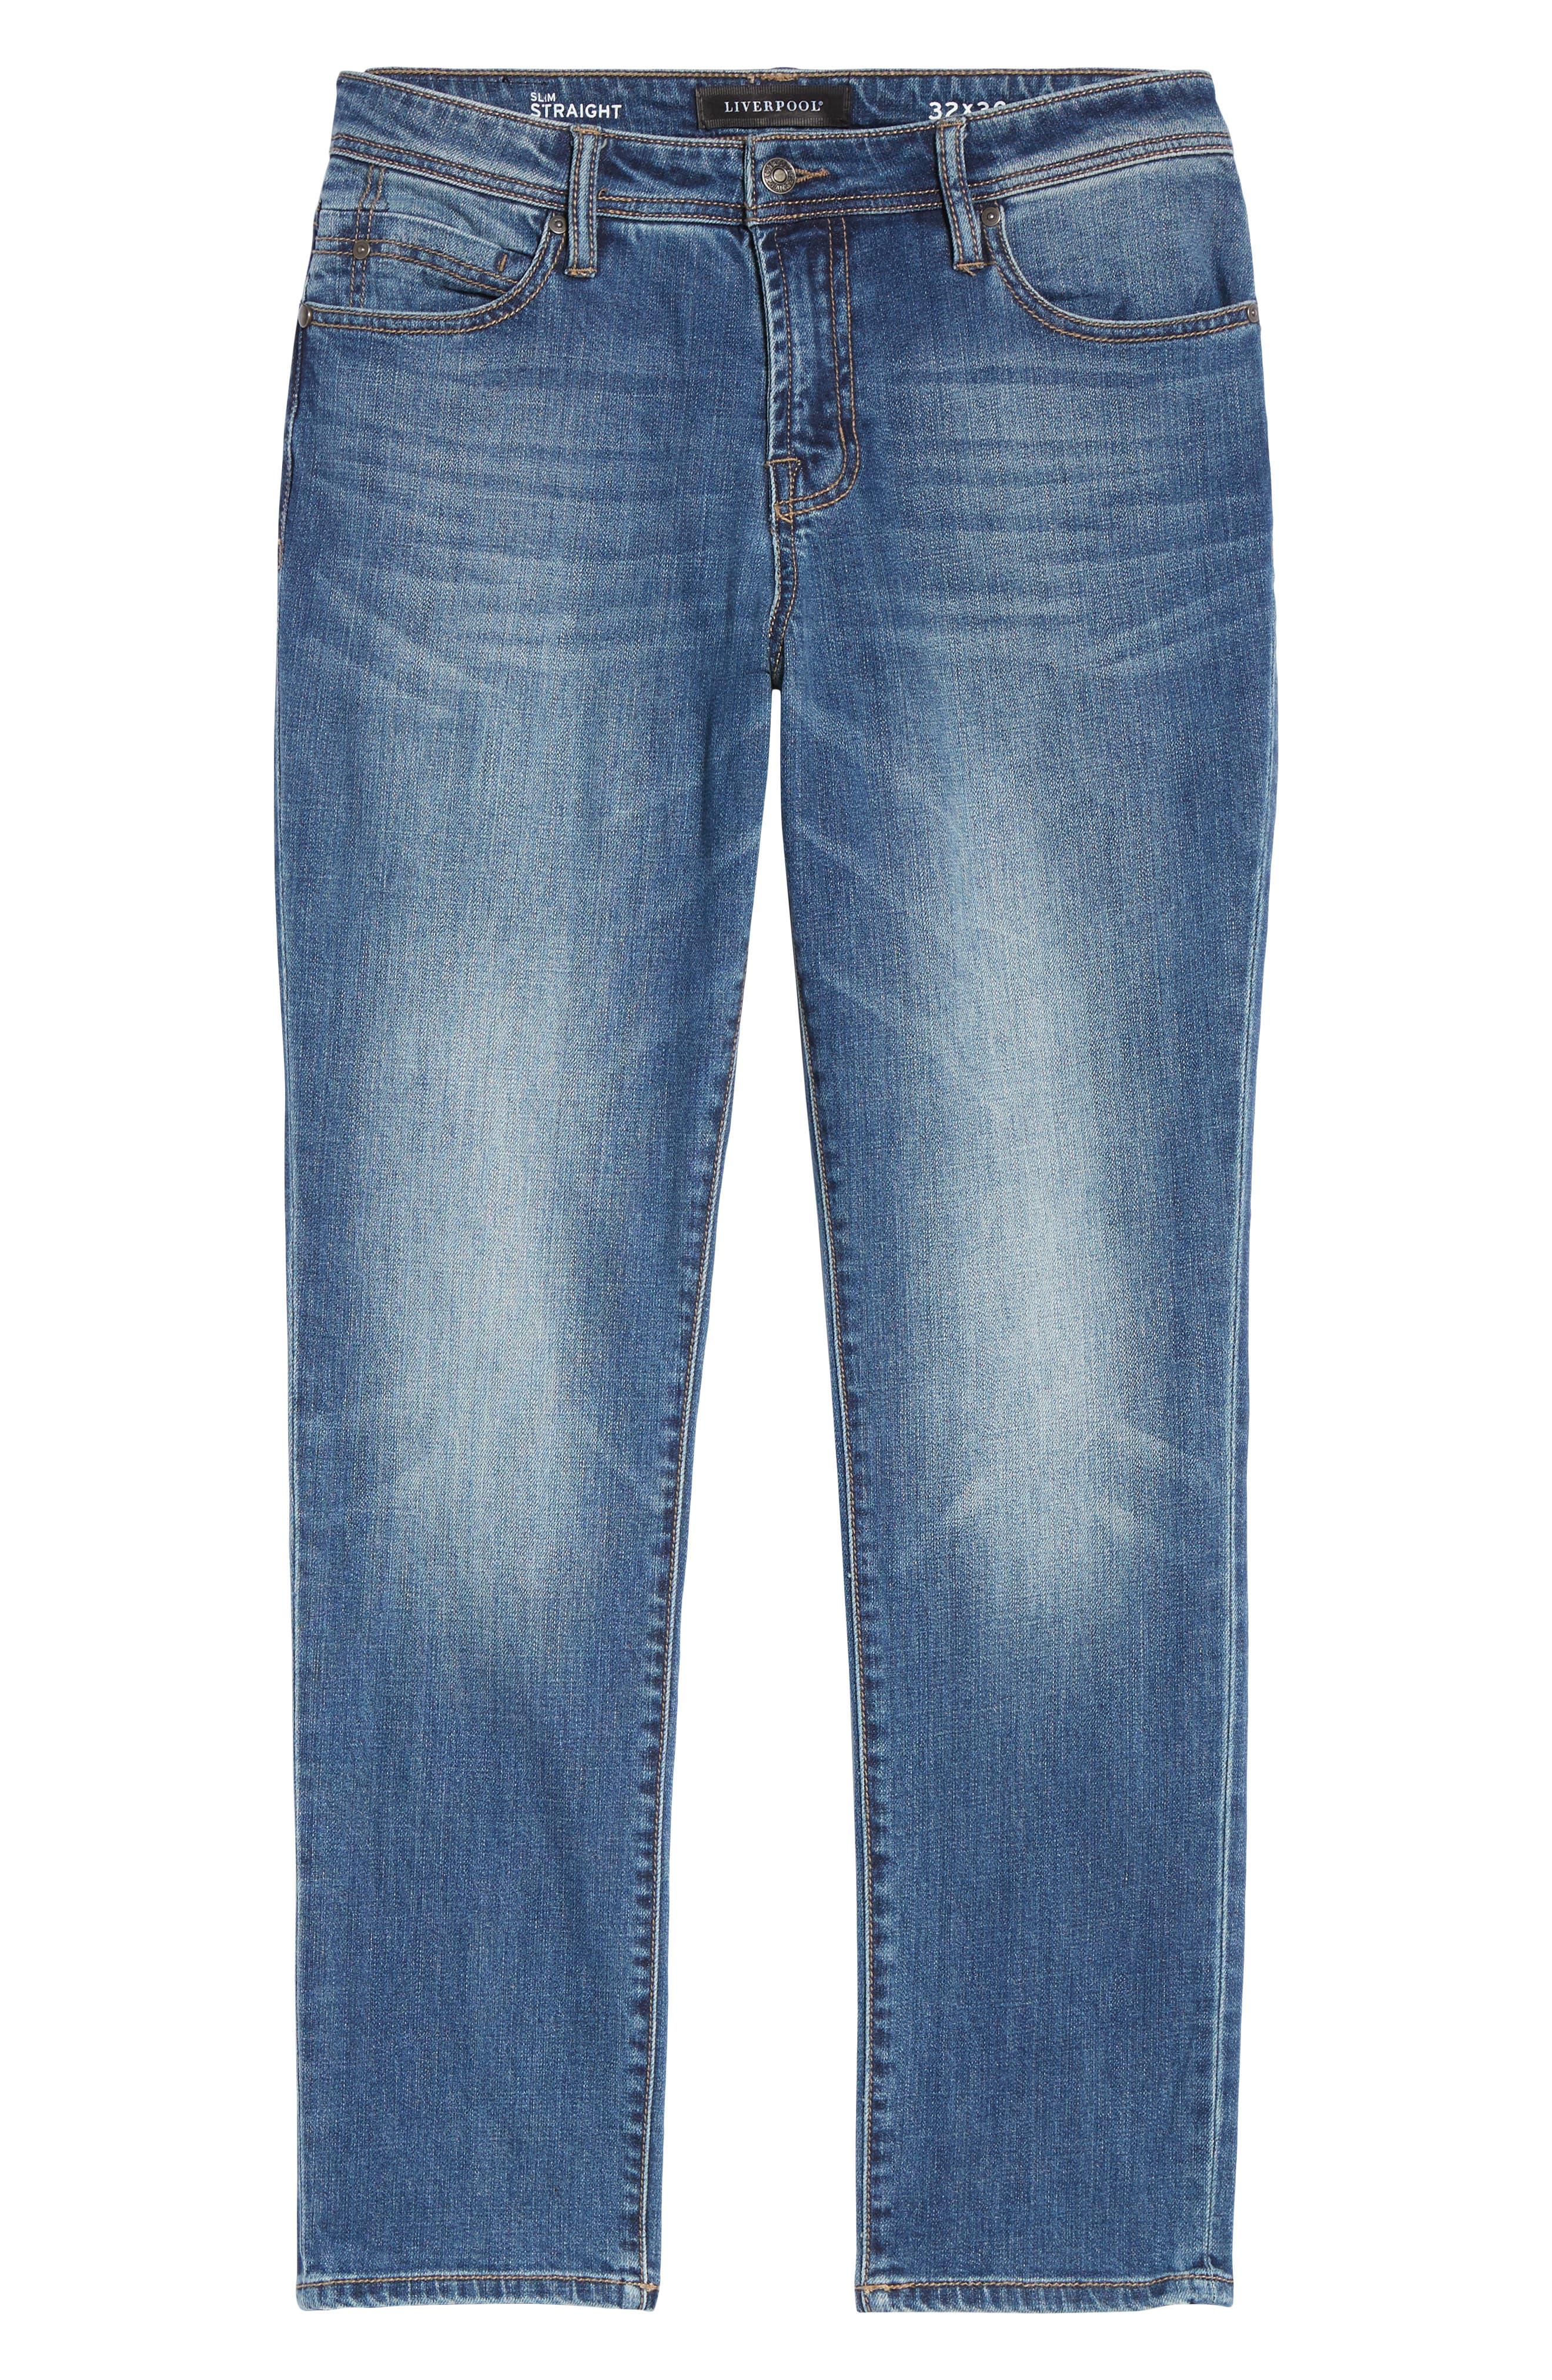 Jeans Co. Slim Straight Leg Jeans,                             Alternate thumbnail 6, color,                             BRYSON VINTAGE MED